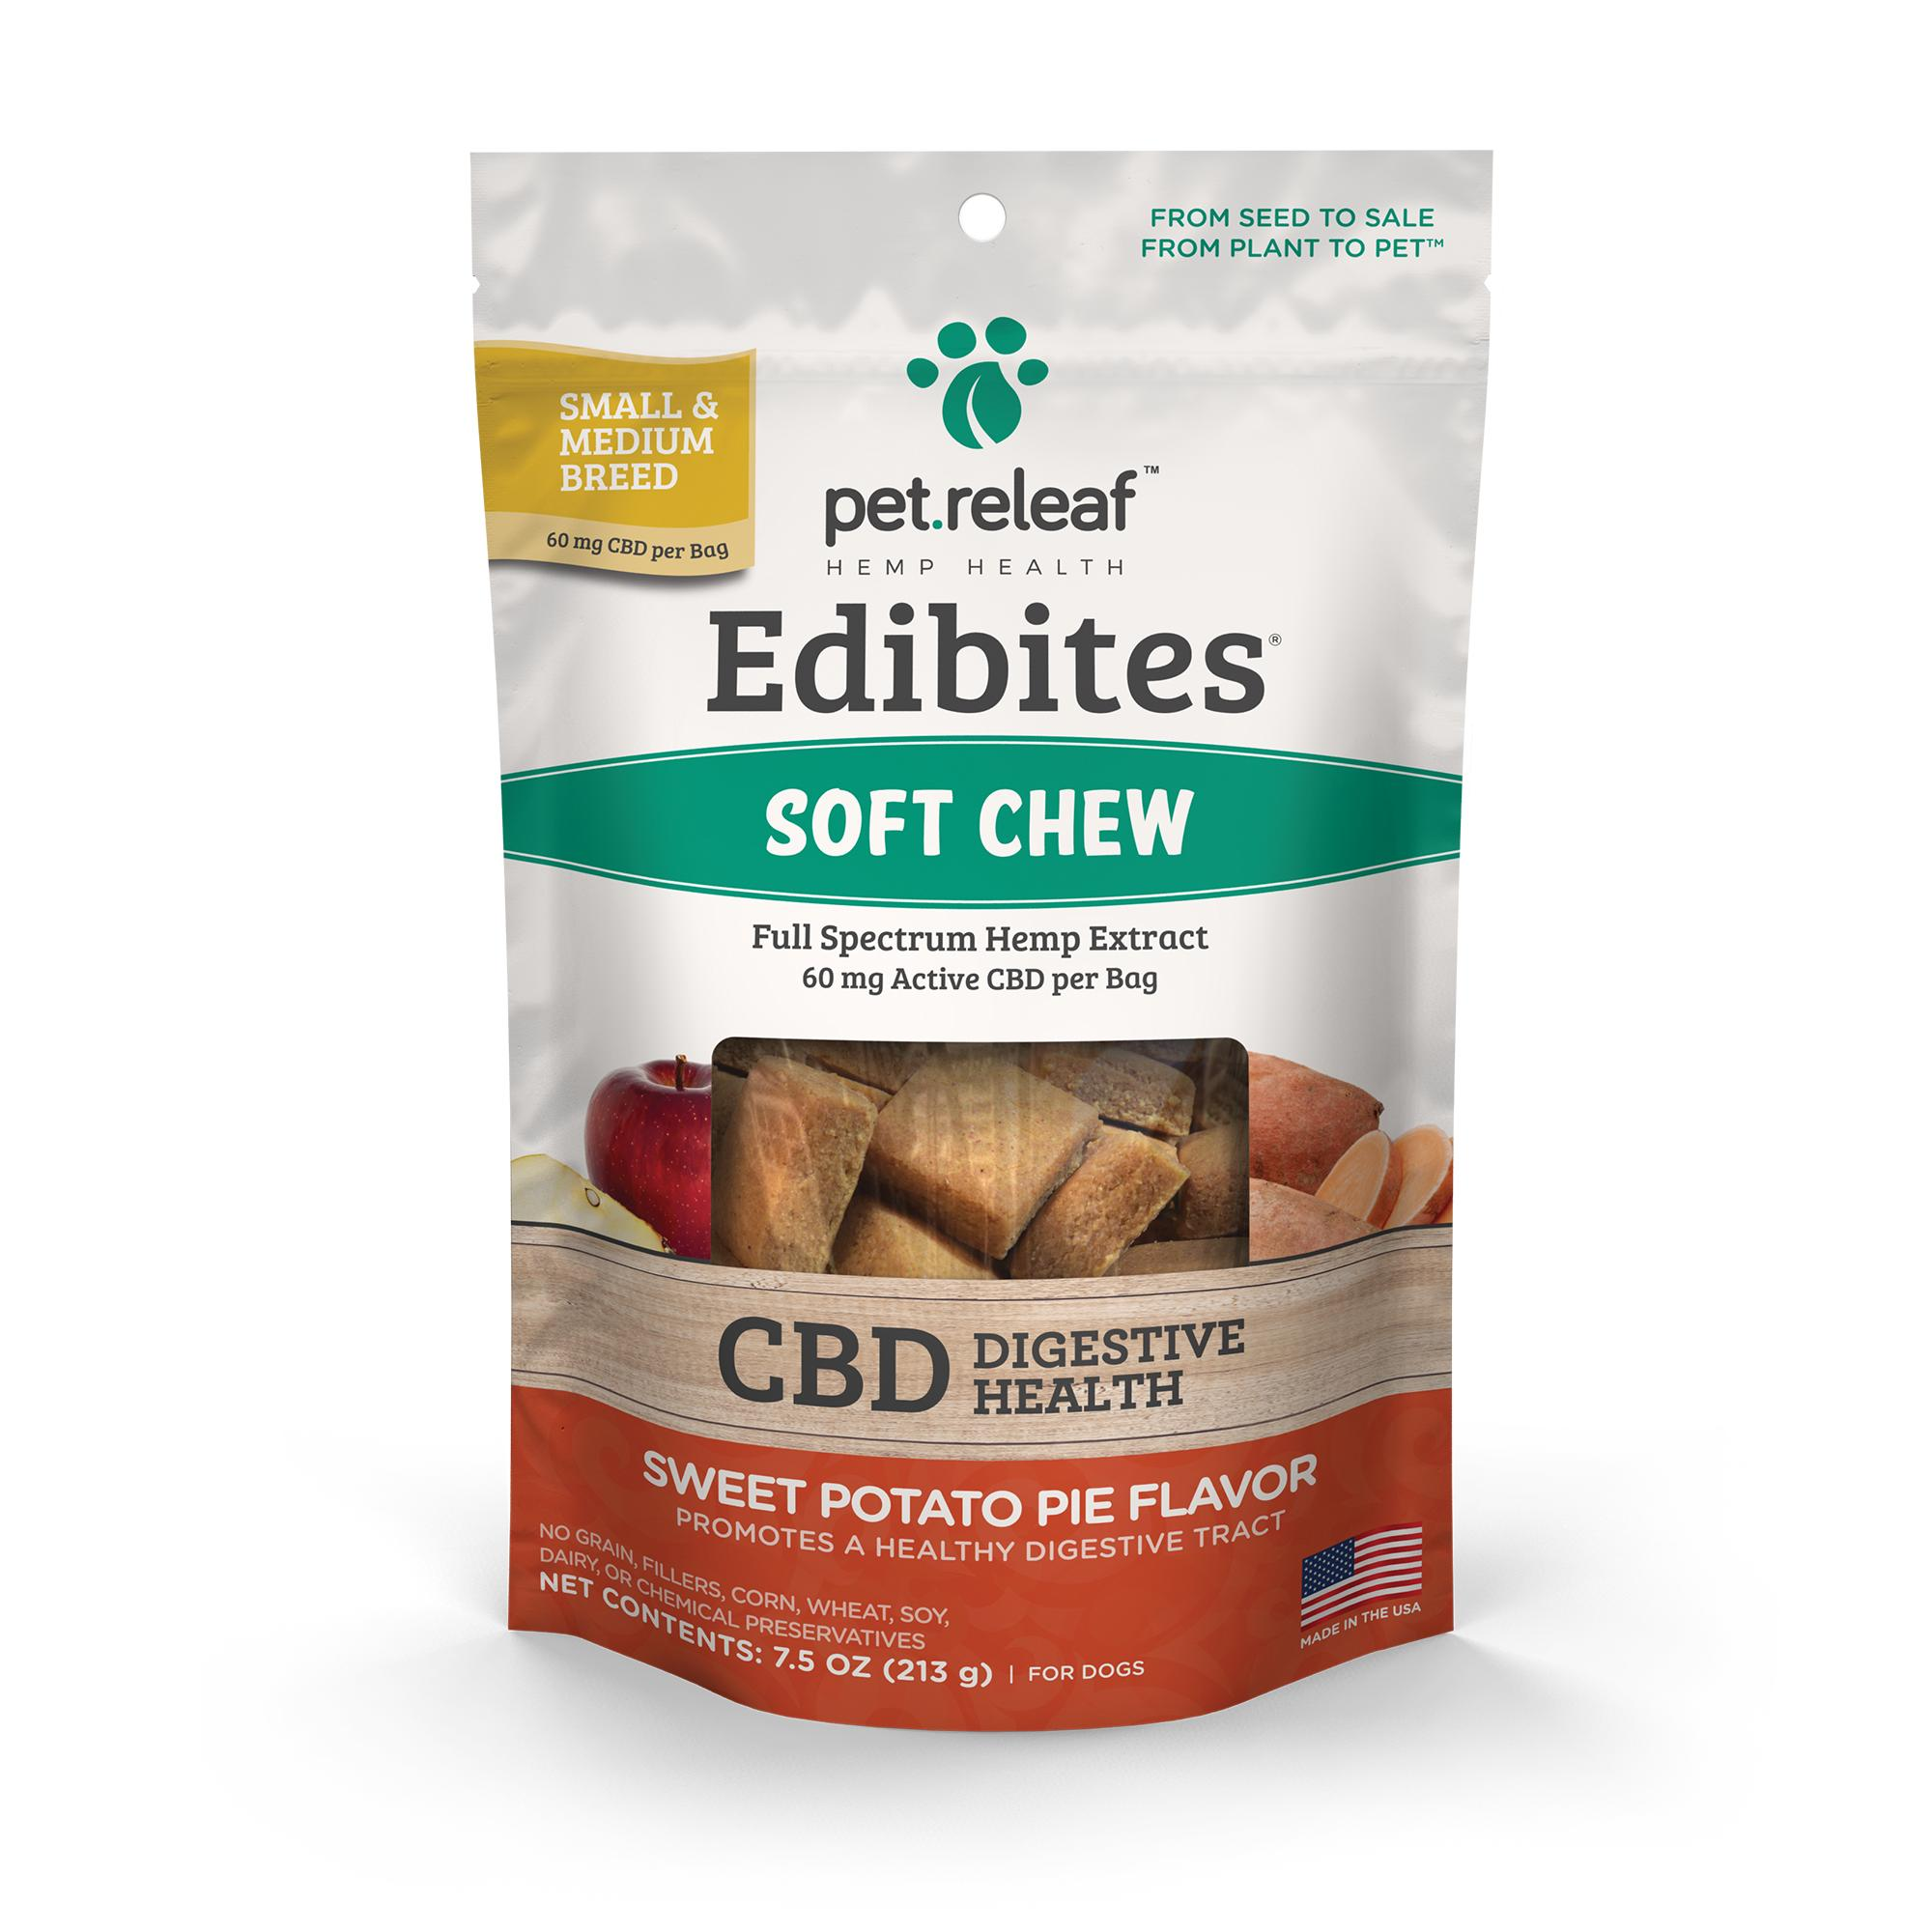 Pet Releaf Edibites Soft Chew Digestive Health Sweet Potato Small & Medium Breed Dog Supplement Image